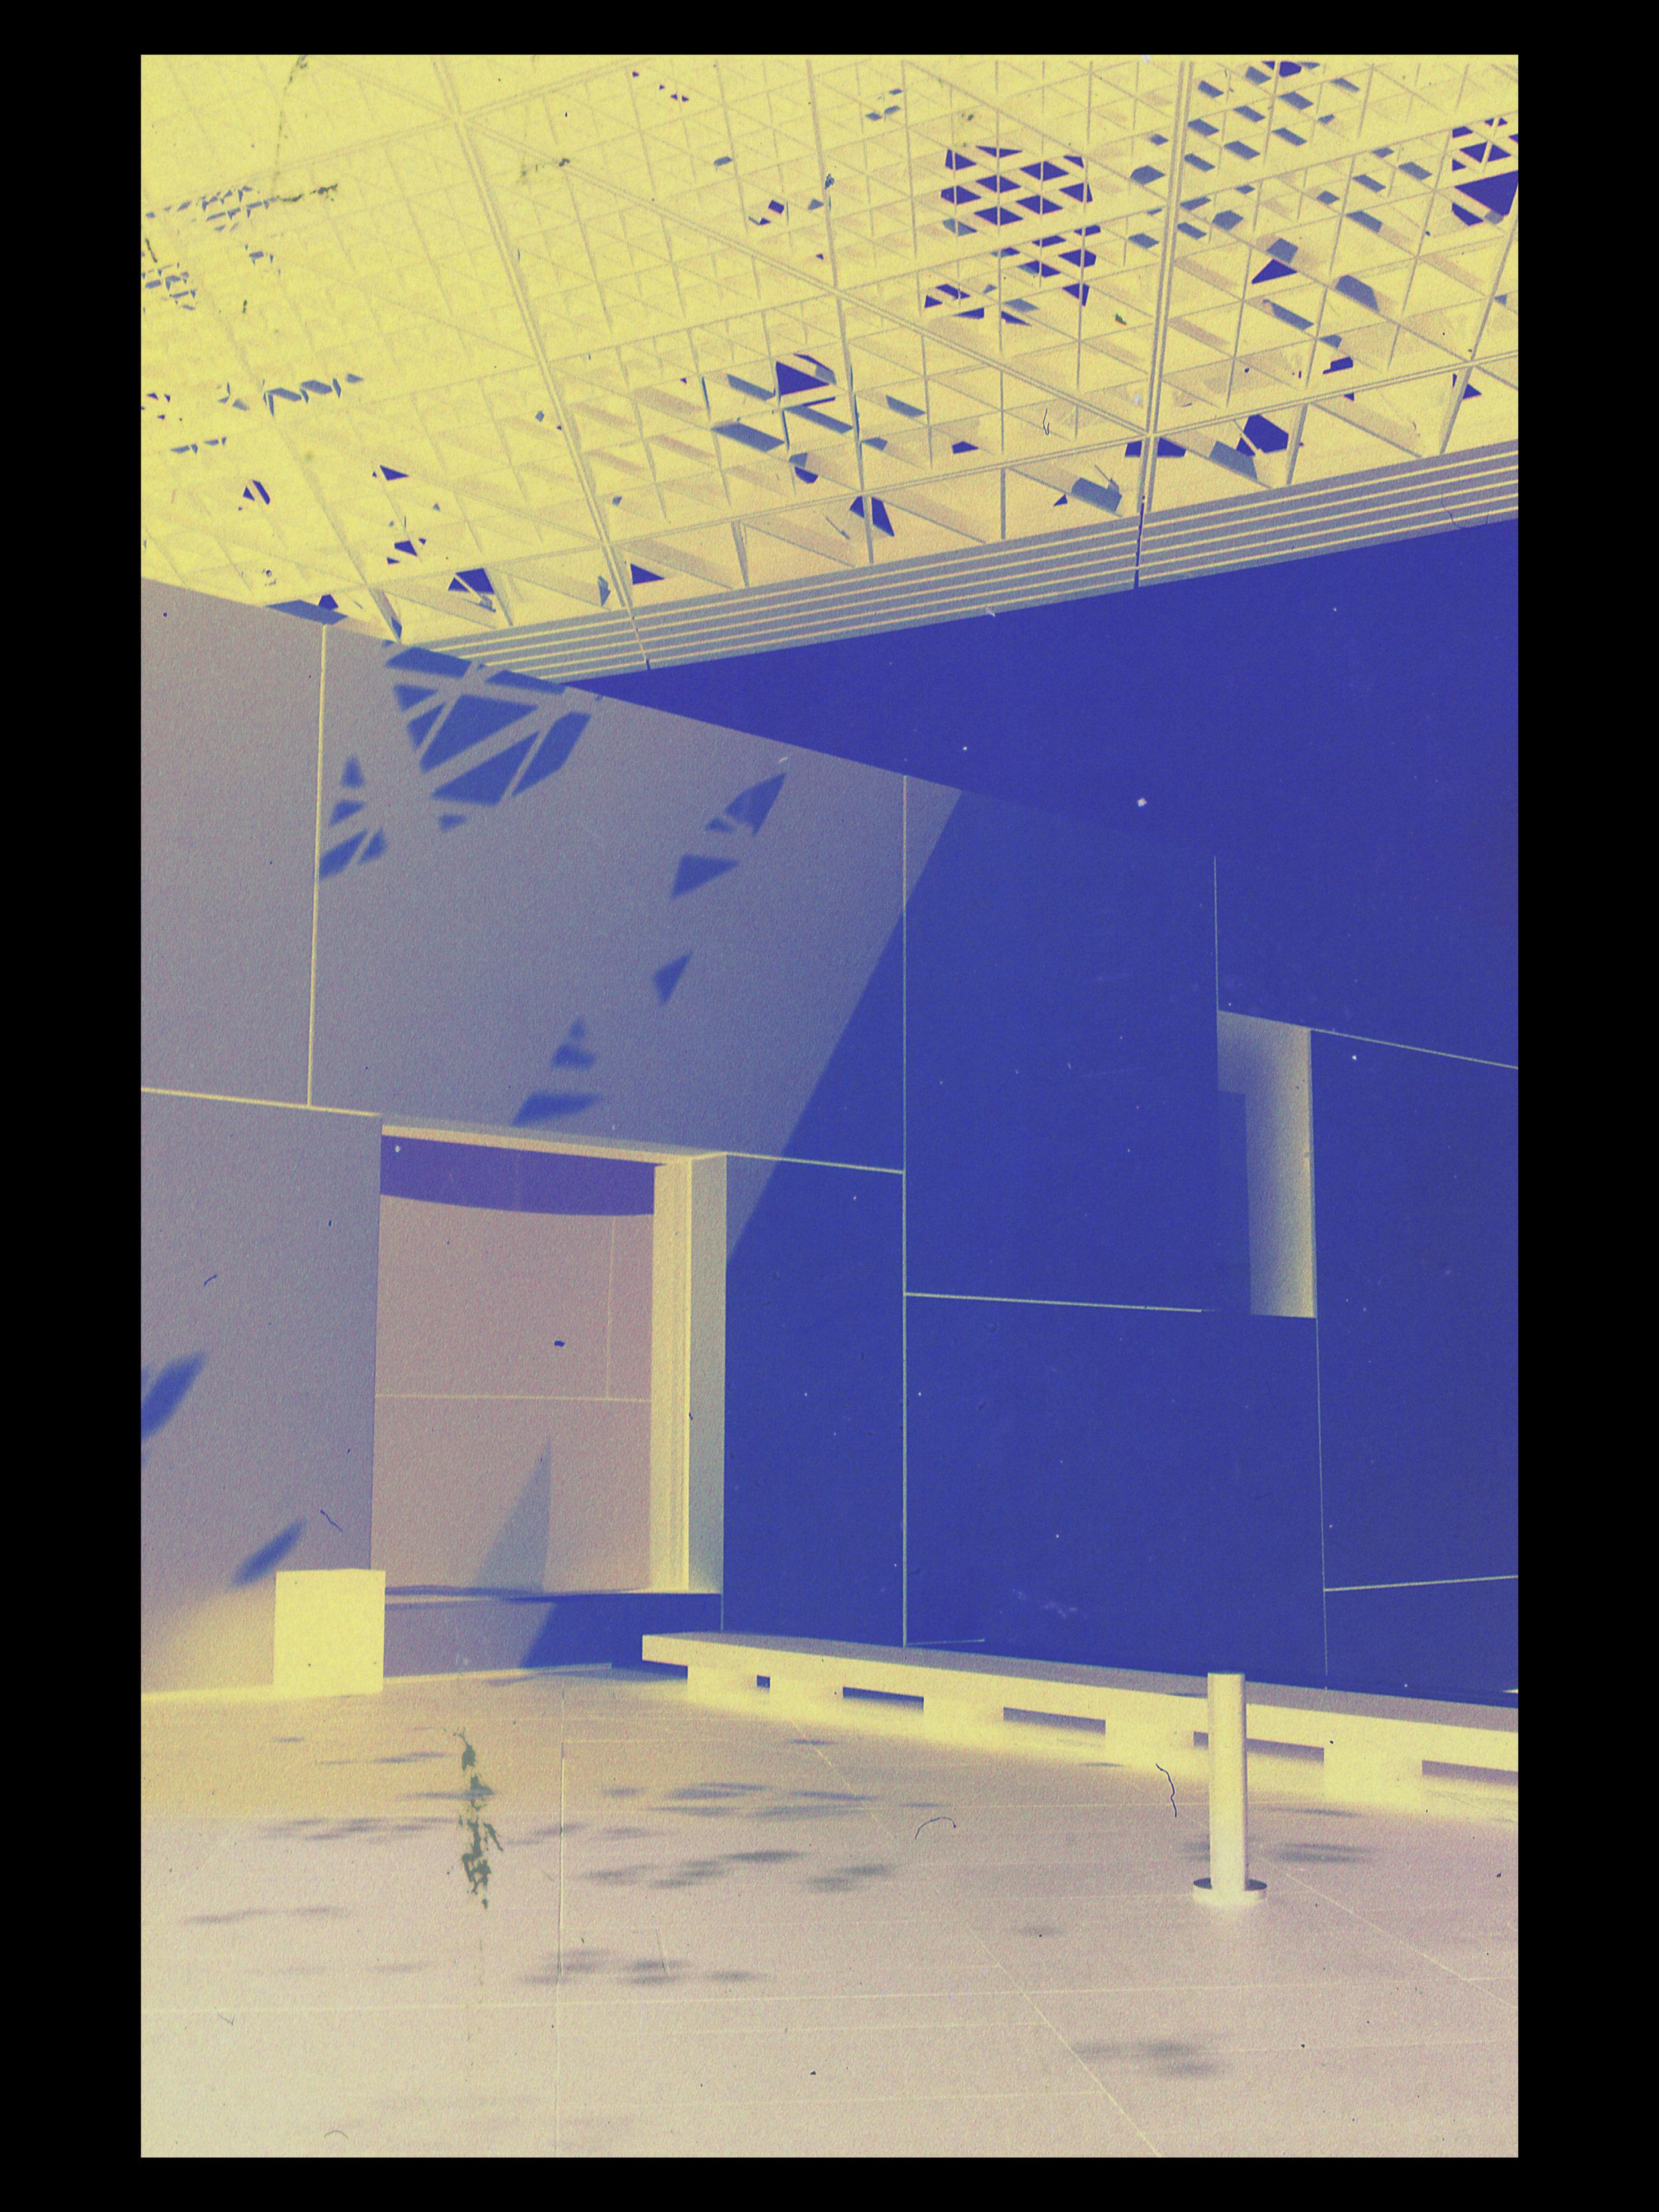 IGportraitlourve03.jpg